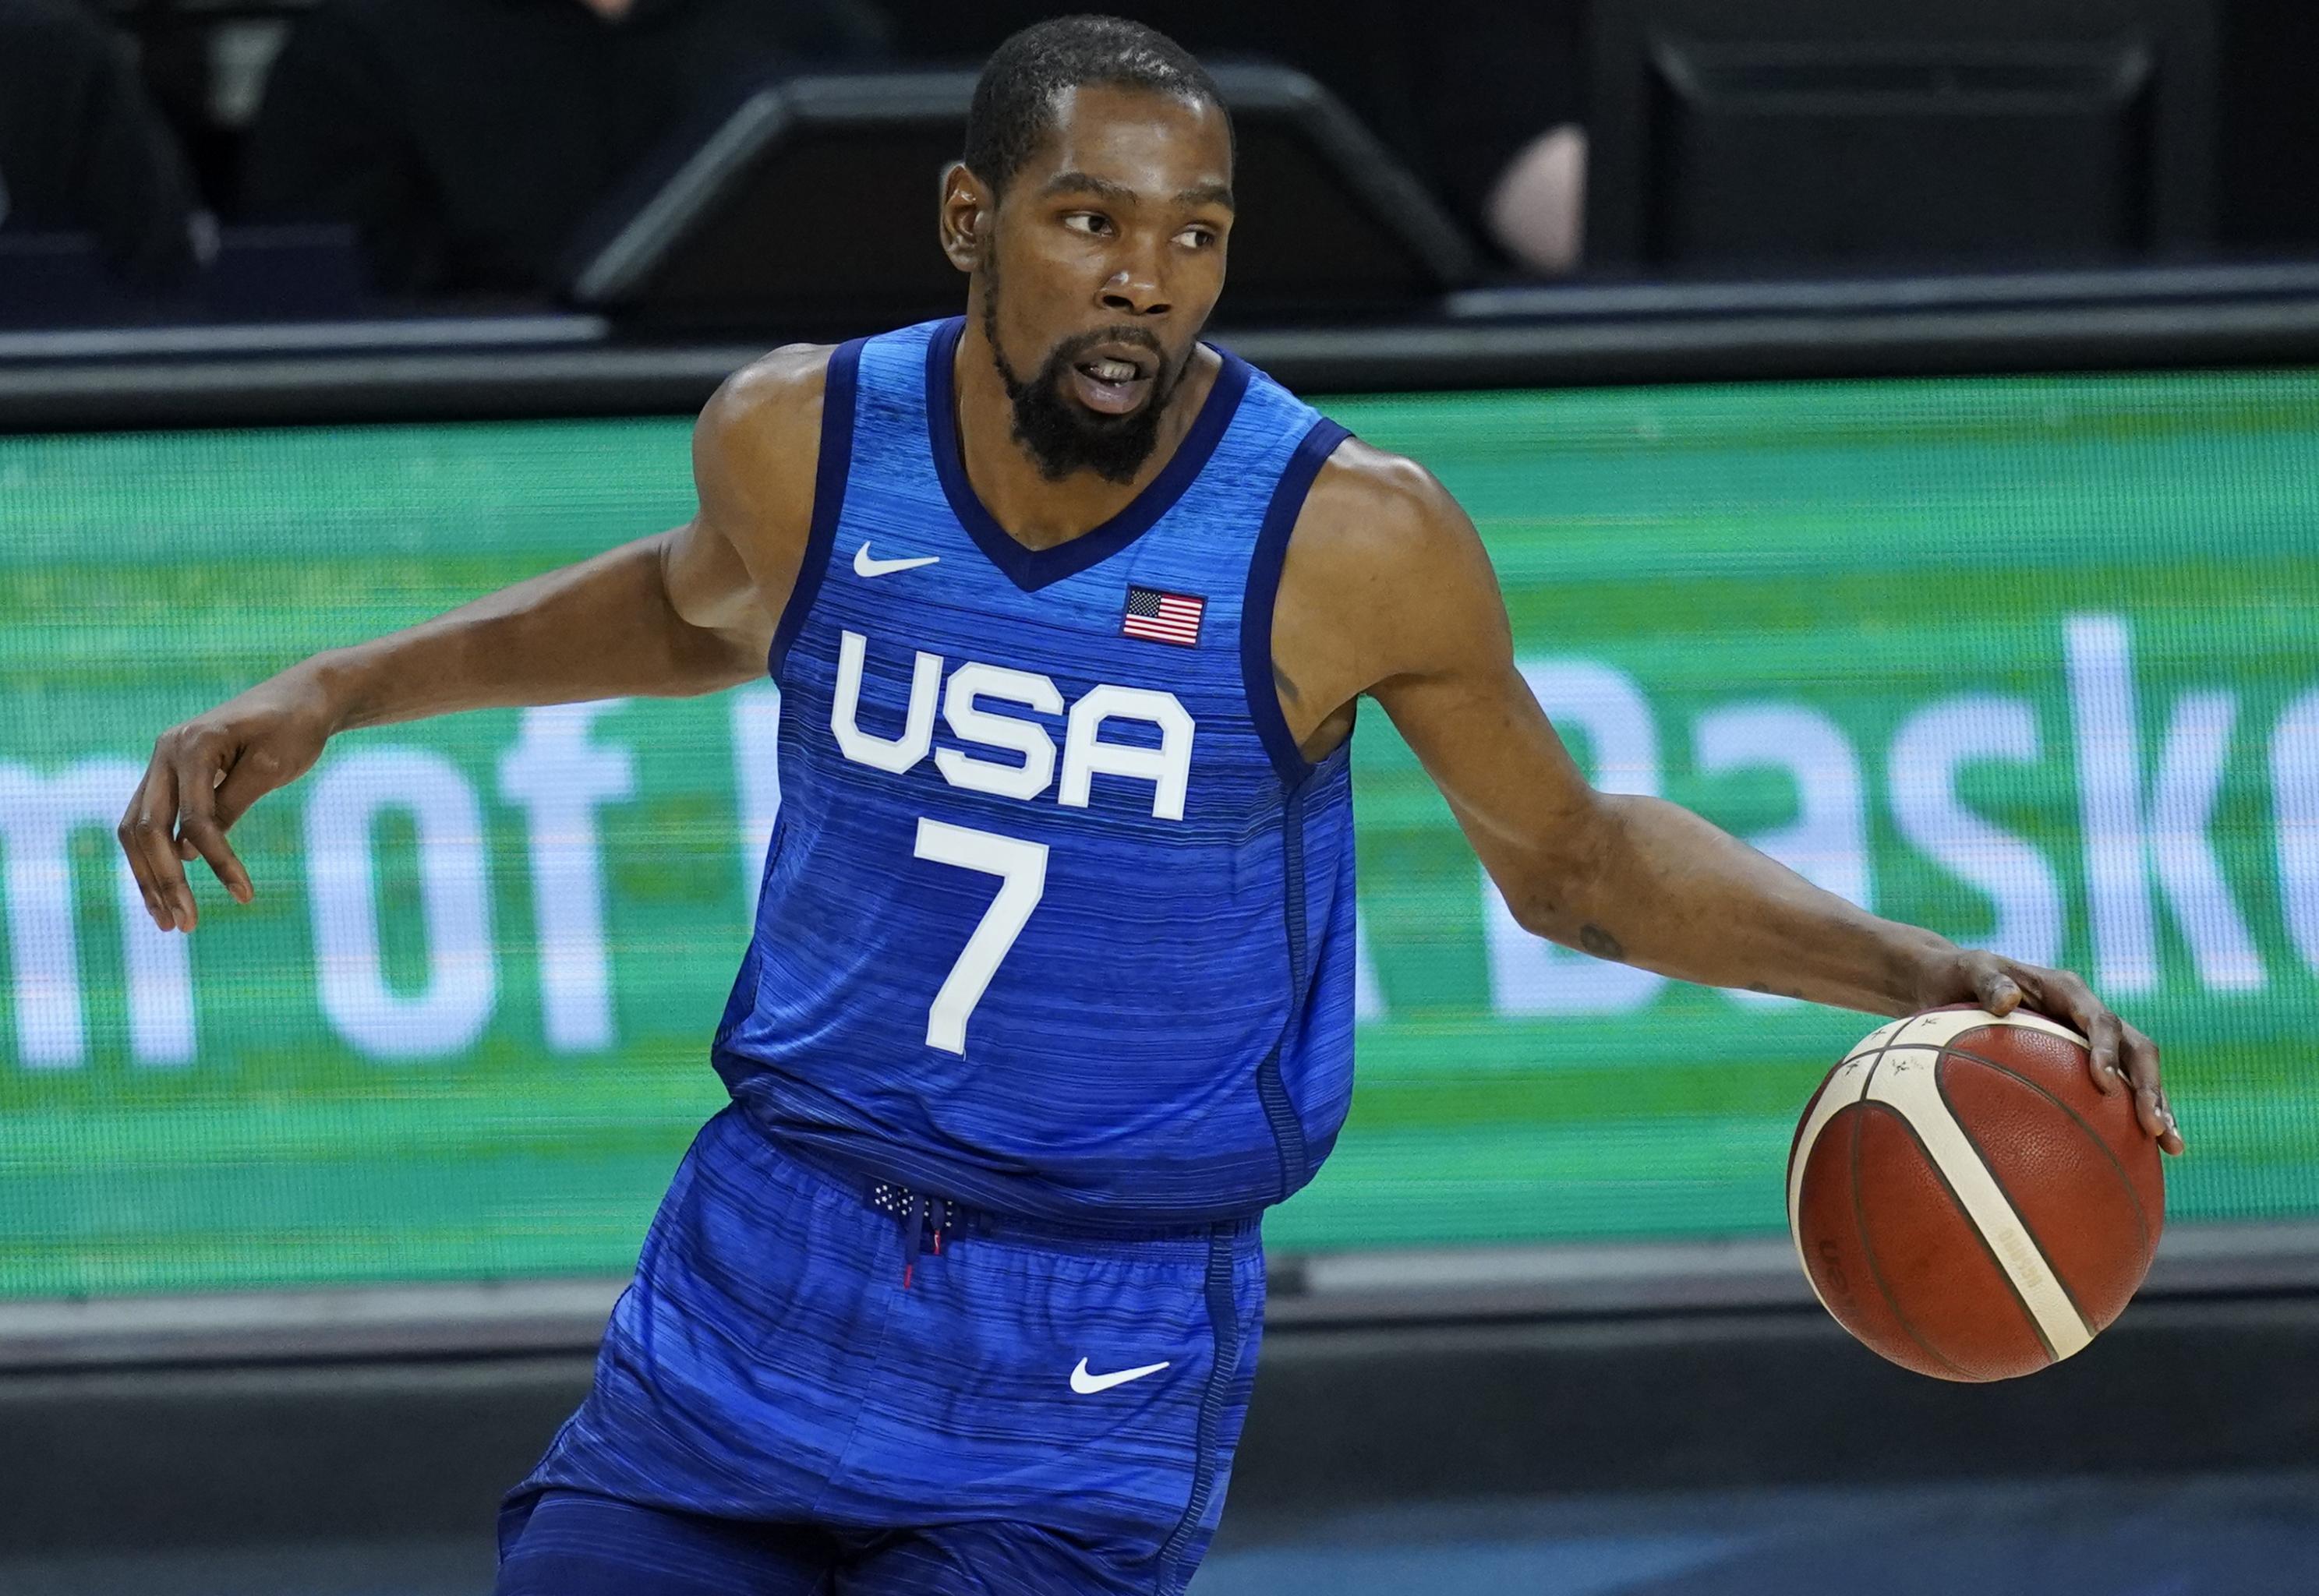 bleacherreport.com - Mo Dakhil - Preview and Predictions for Tokyo Olympics Men's Basketball Tournament